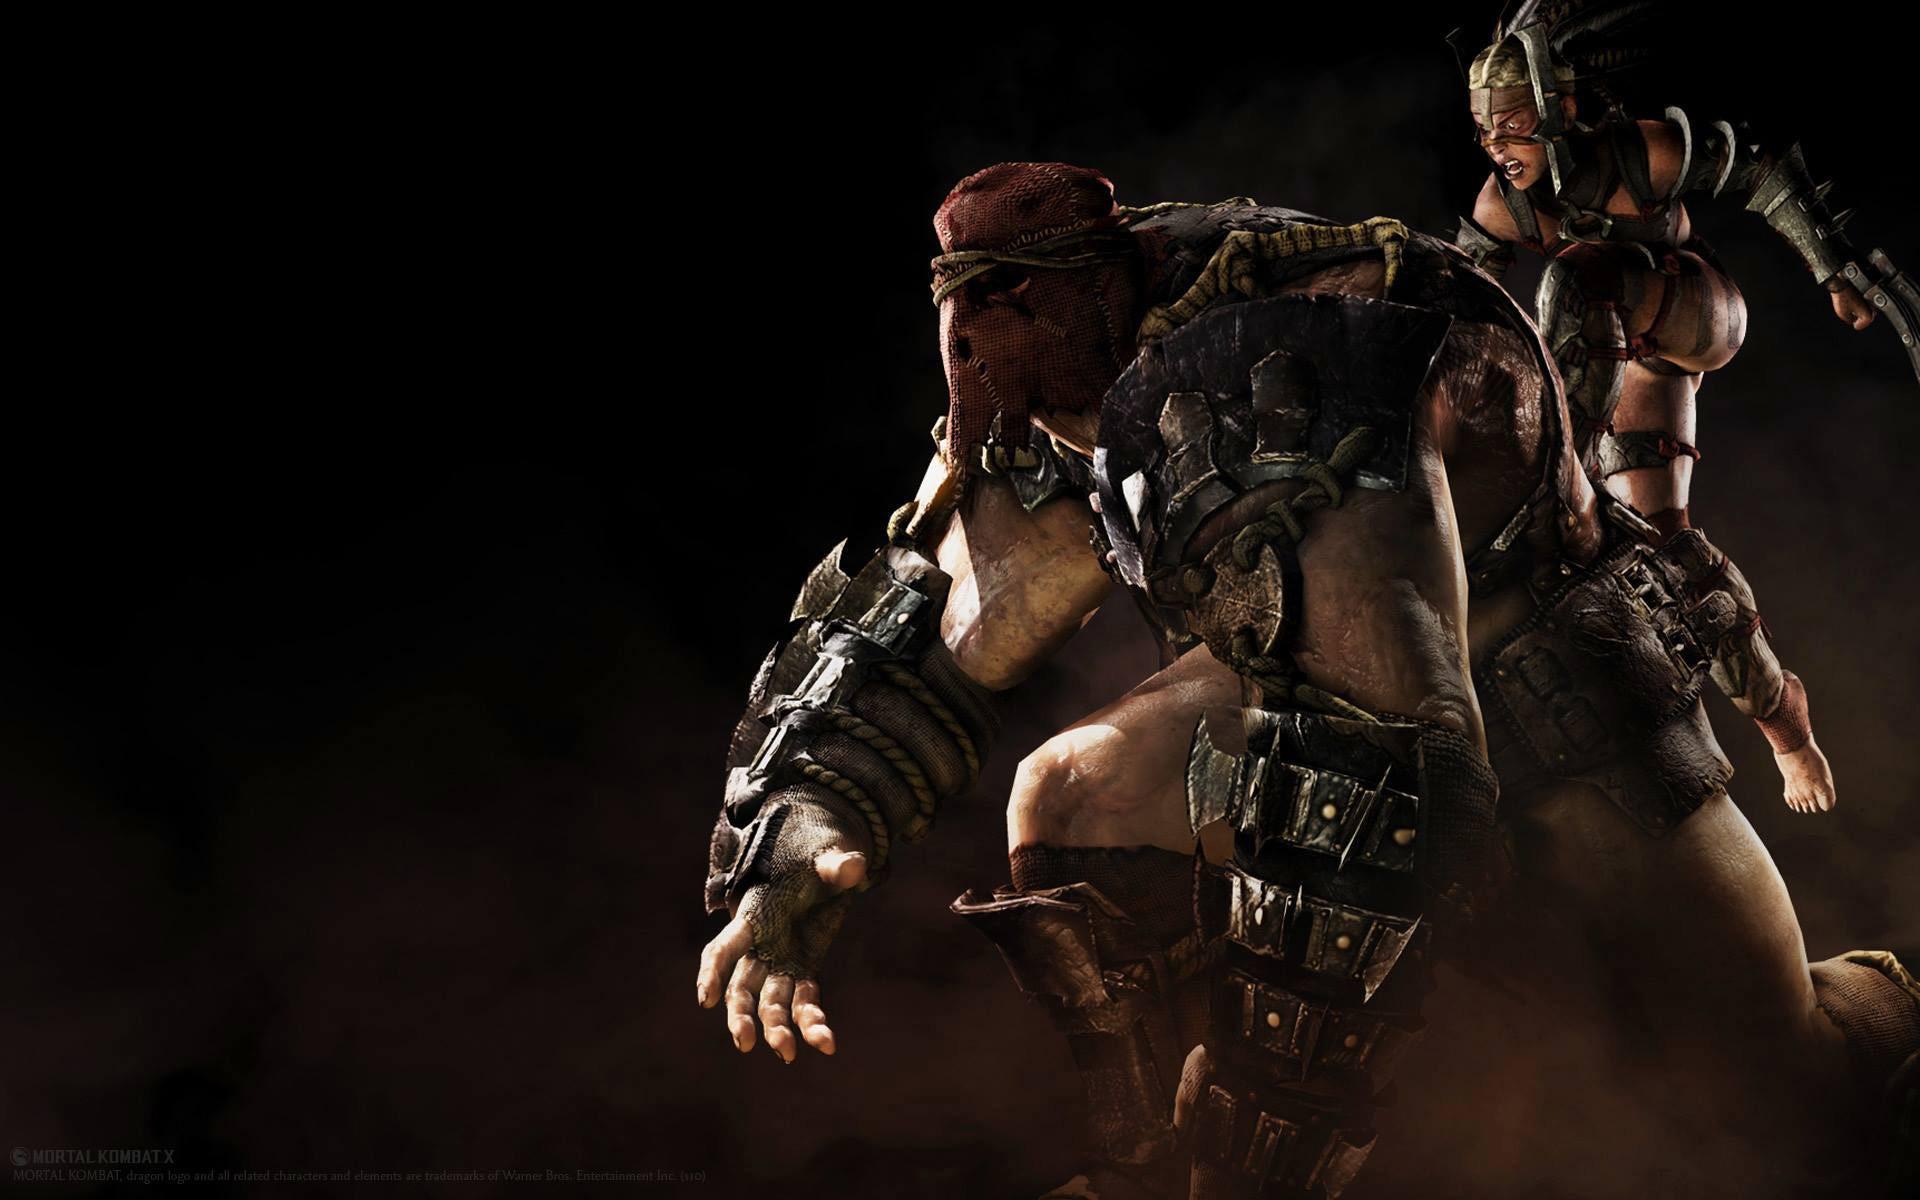 71 Mortal Kombat X Scorpion